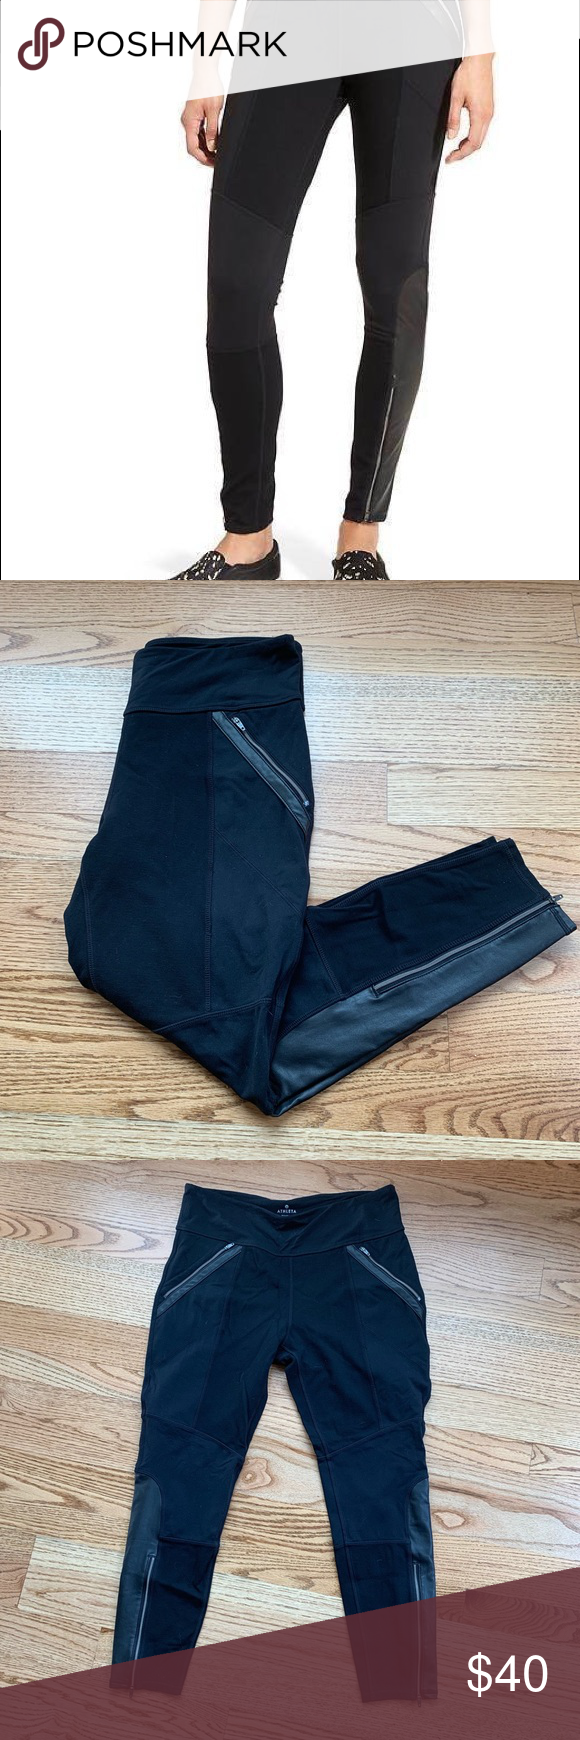 b119c5c4c8b184 Athleta | Ponte Luxe Faux Leather Zip Legging XL Athleta brand thick Moto-  style leggings